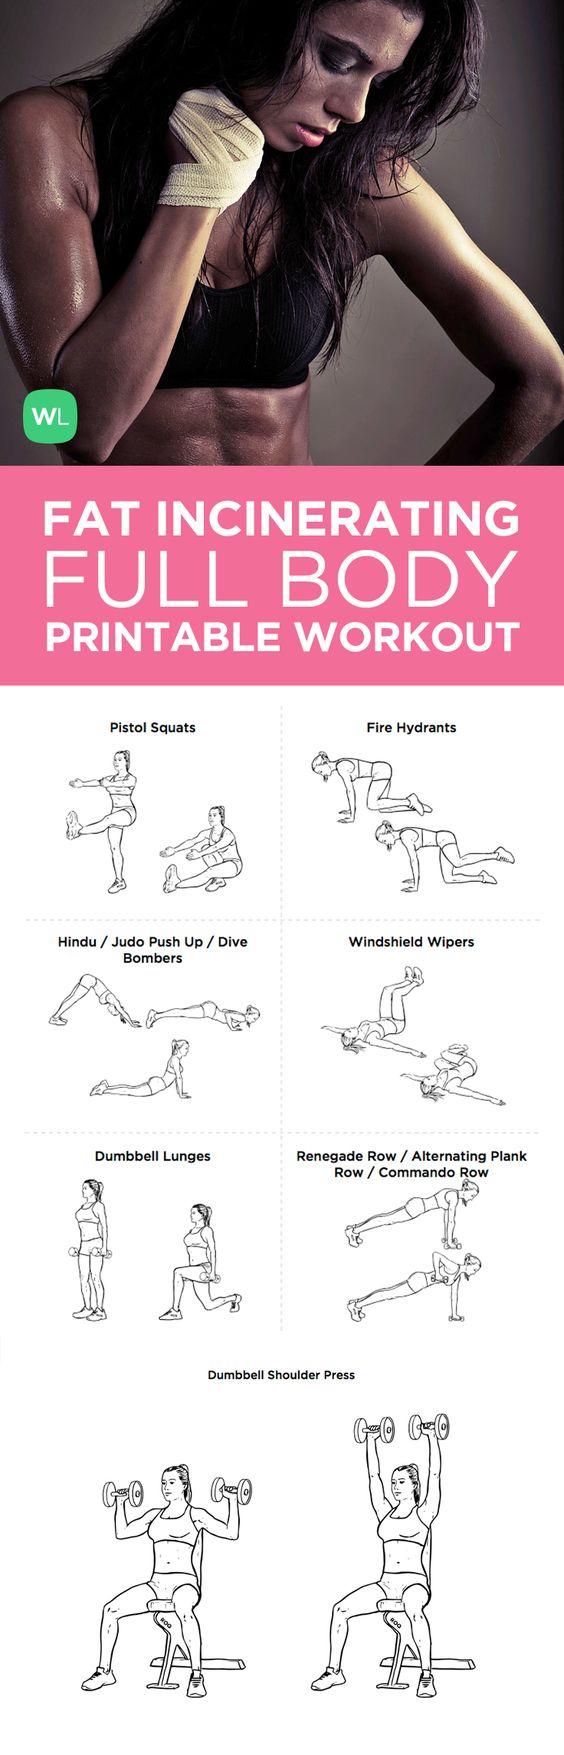 body workouts 15 min workout workout routines body workouts fitness ...